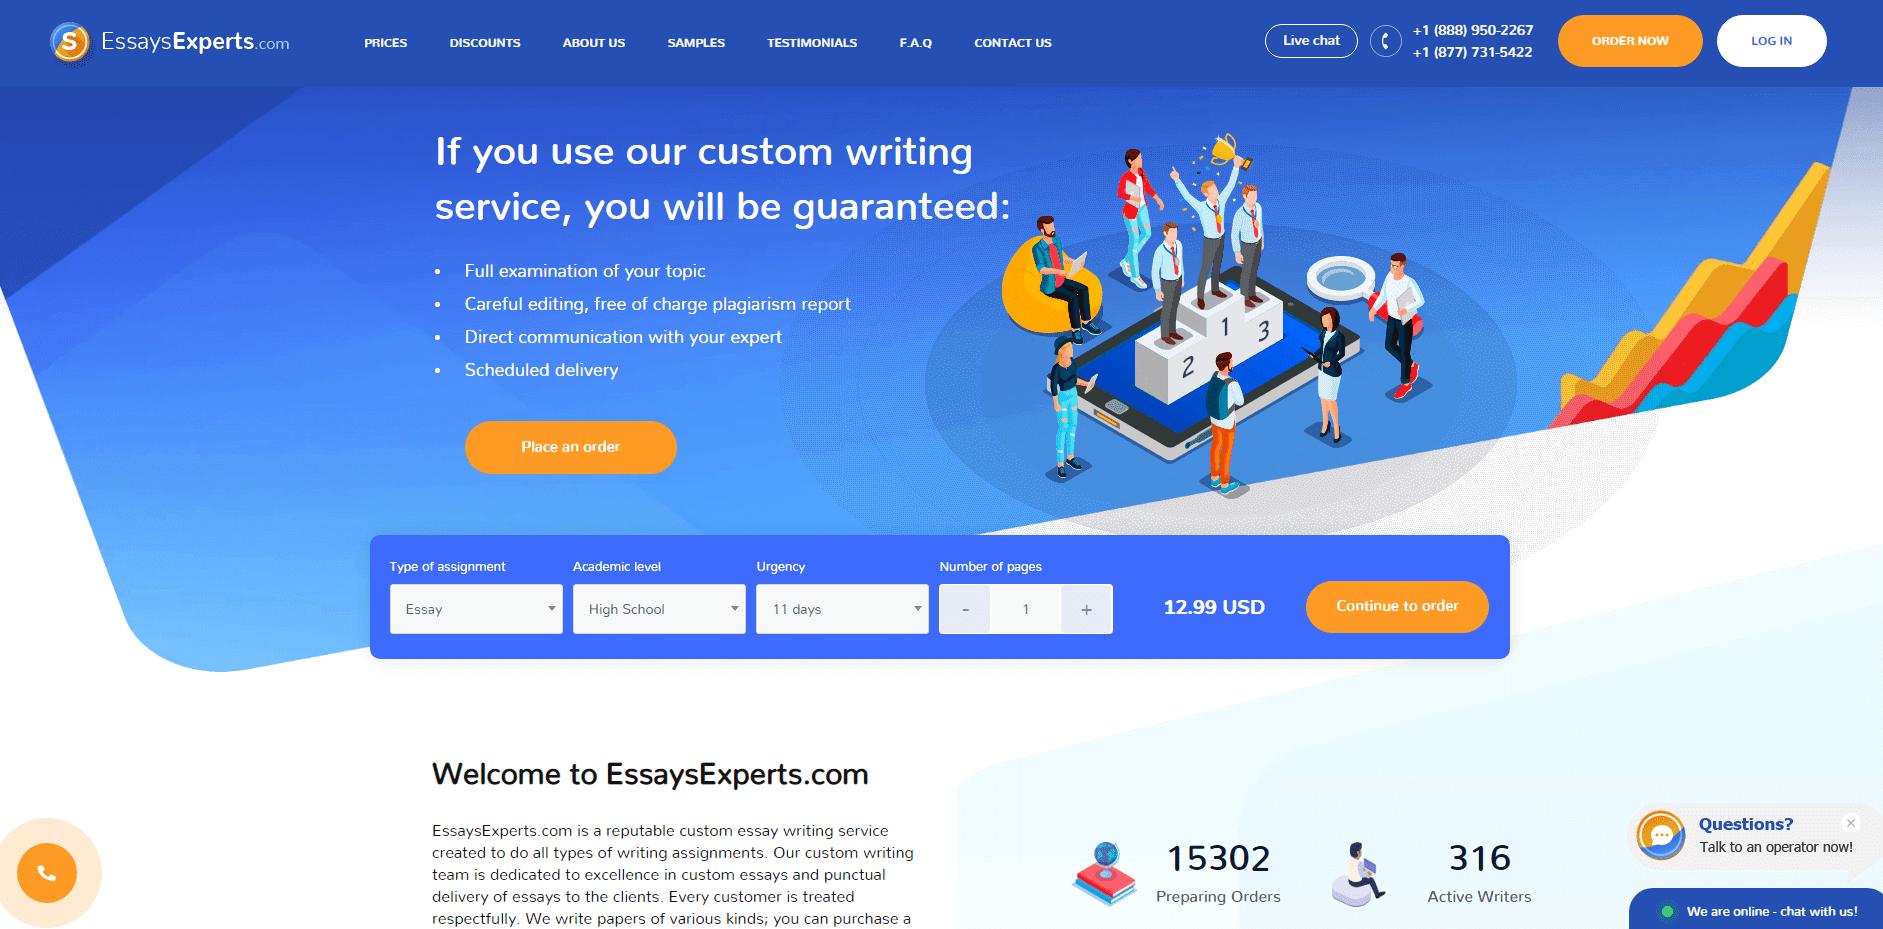 EssaysExperts.com Review